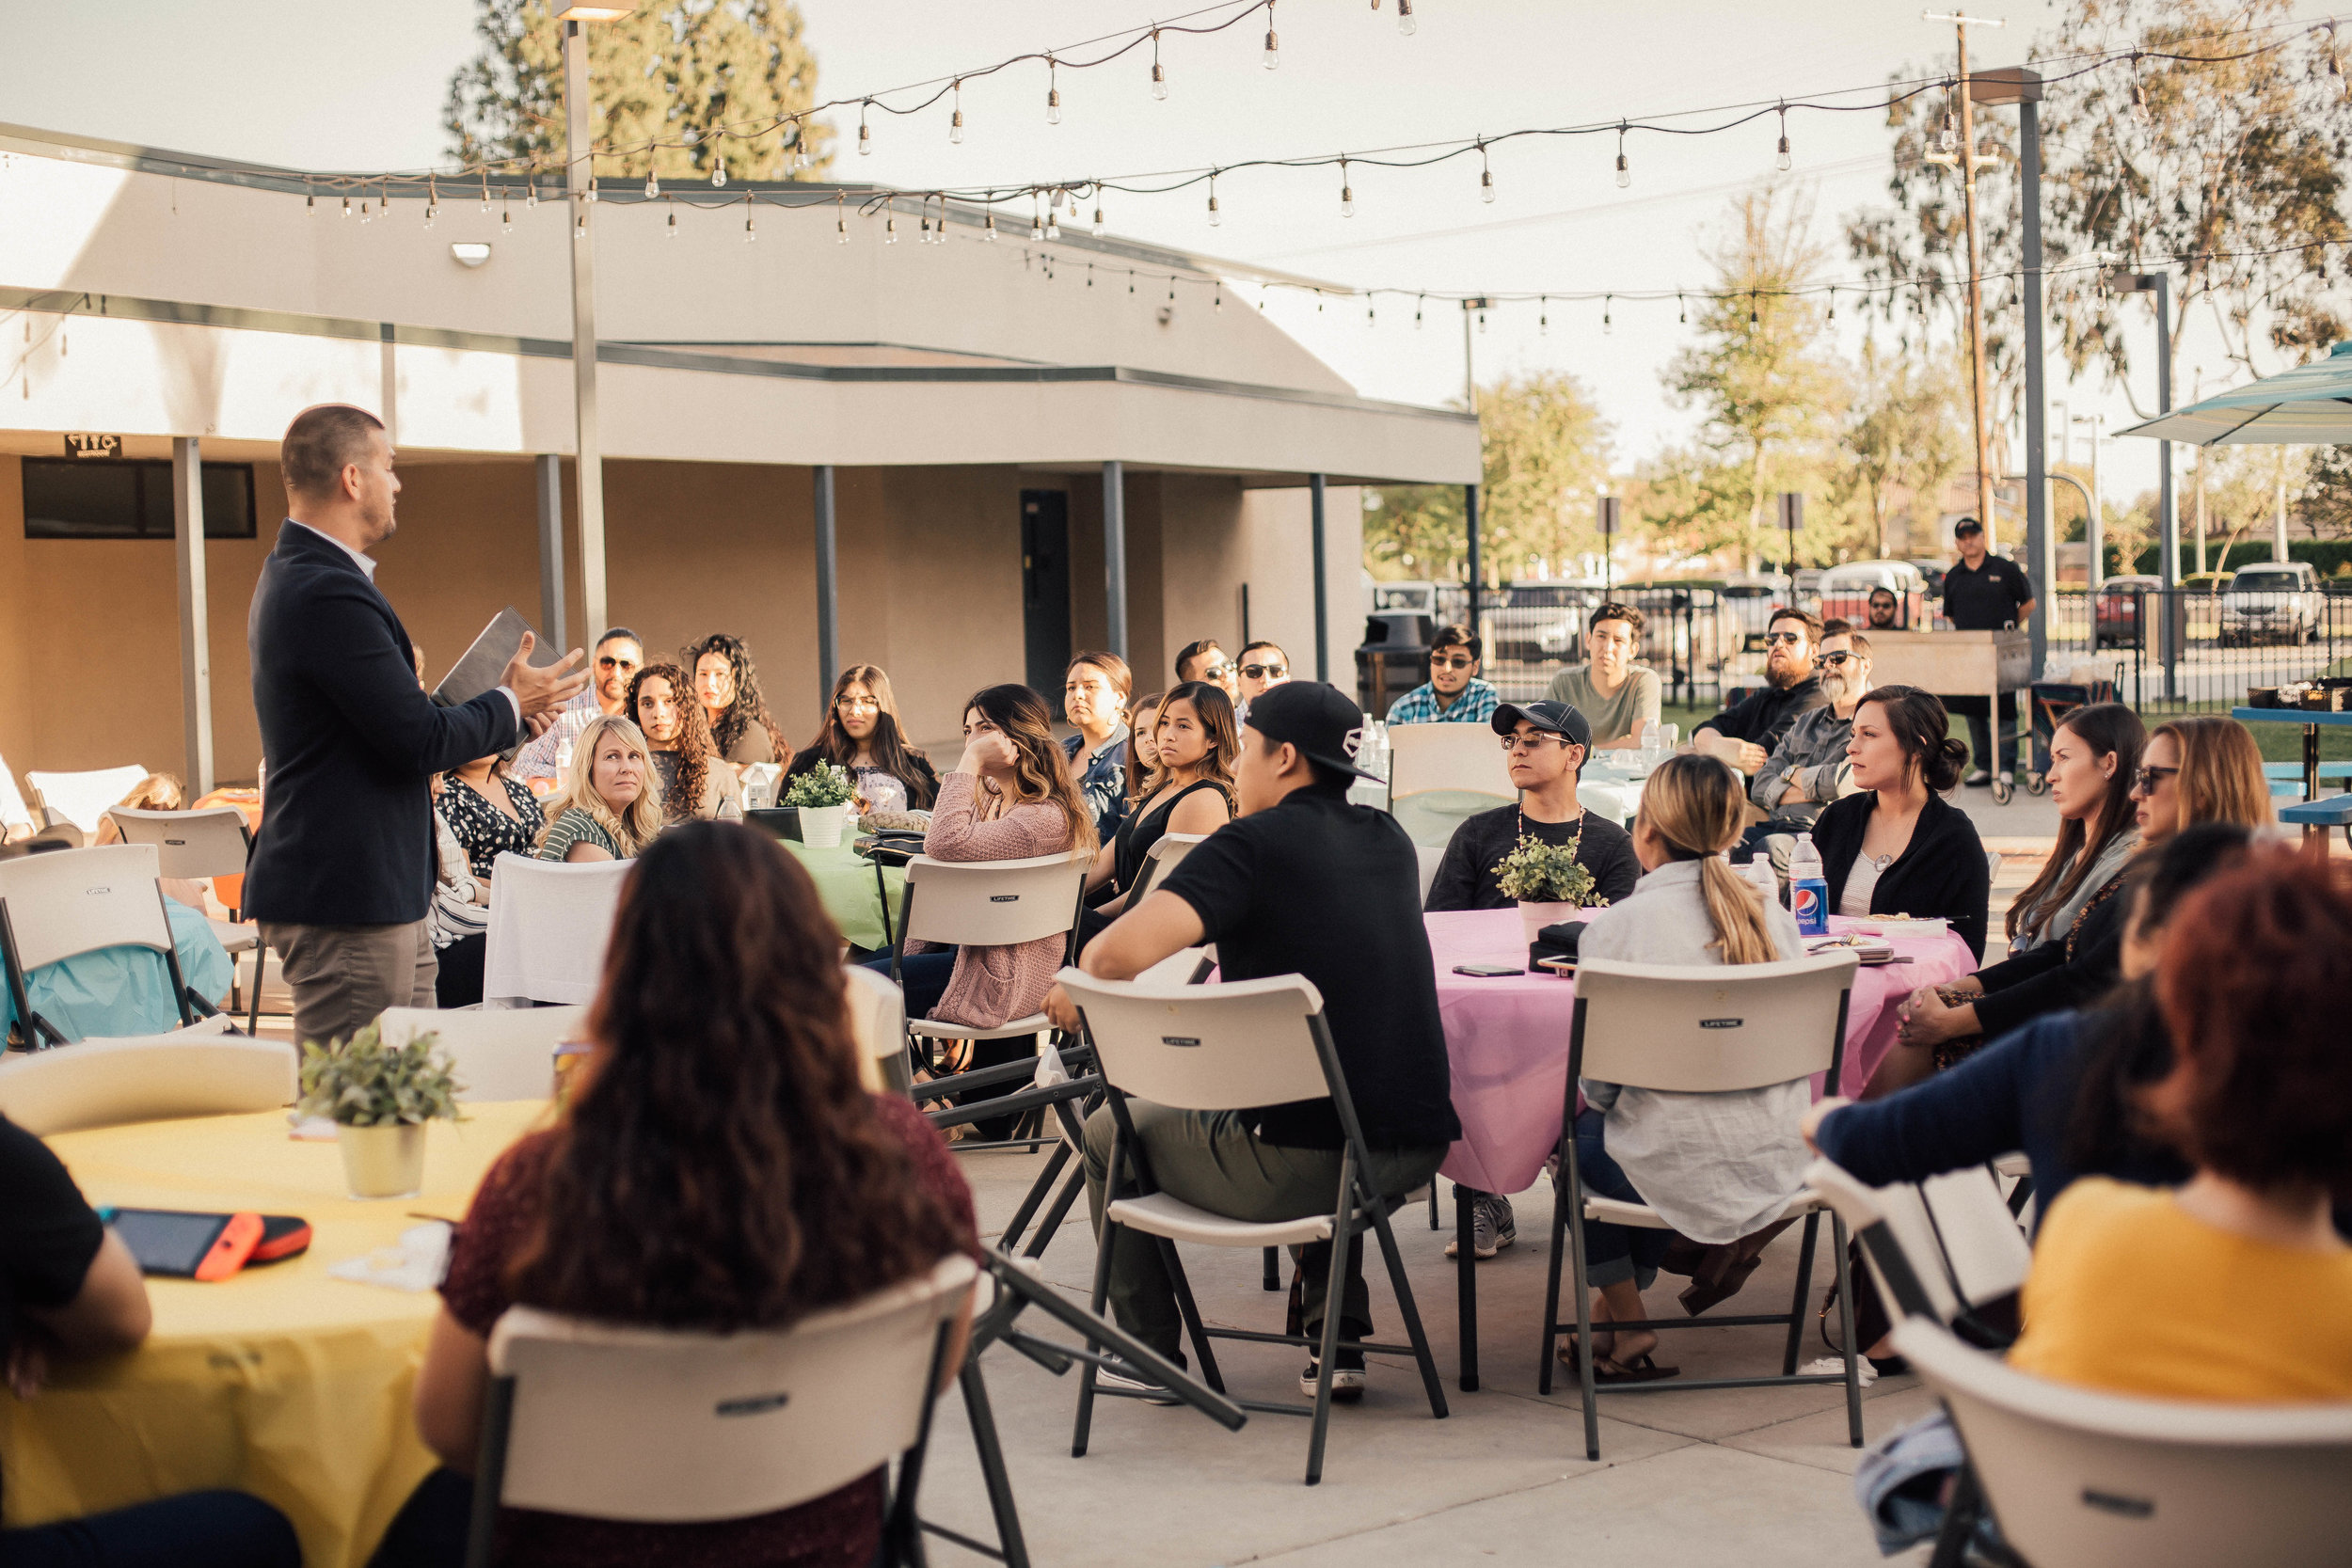 Dinner banquet spring 2019 -